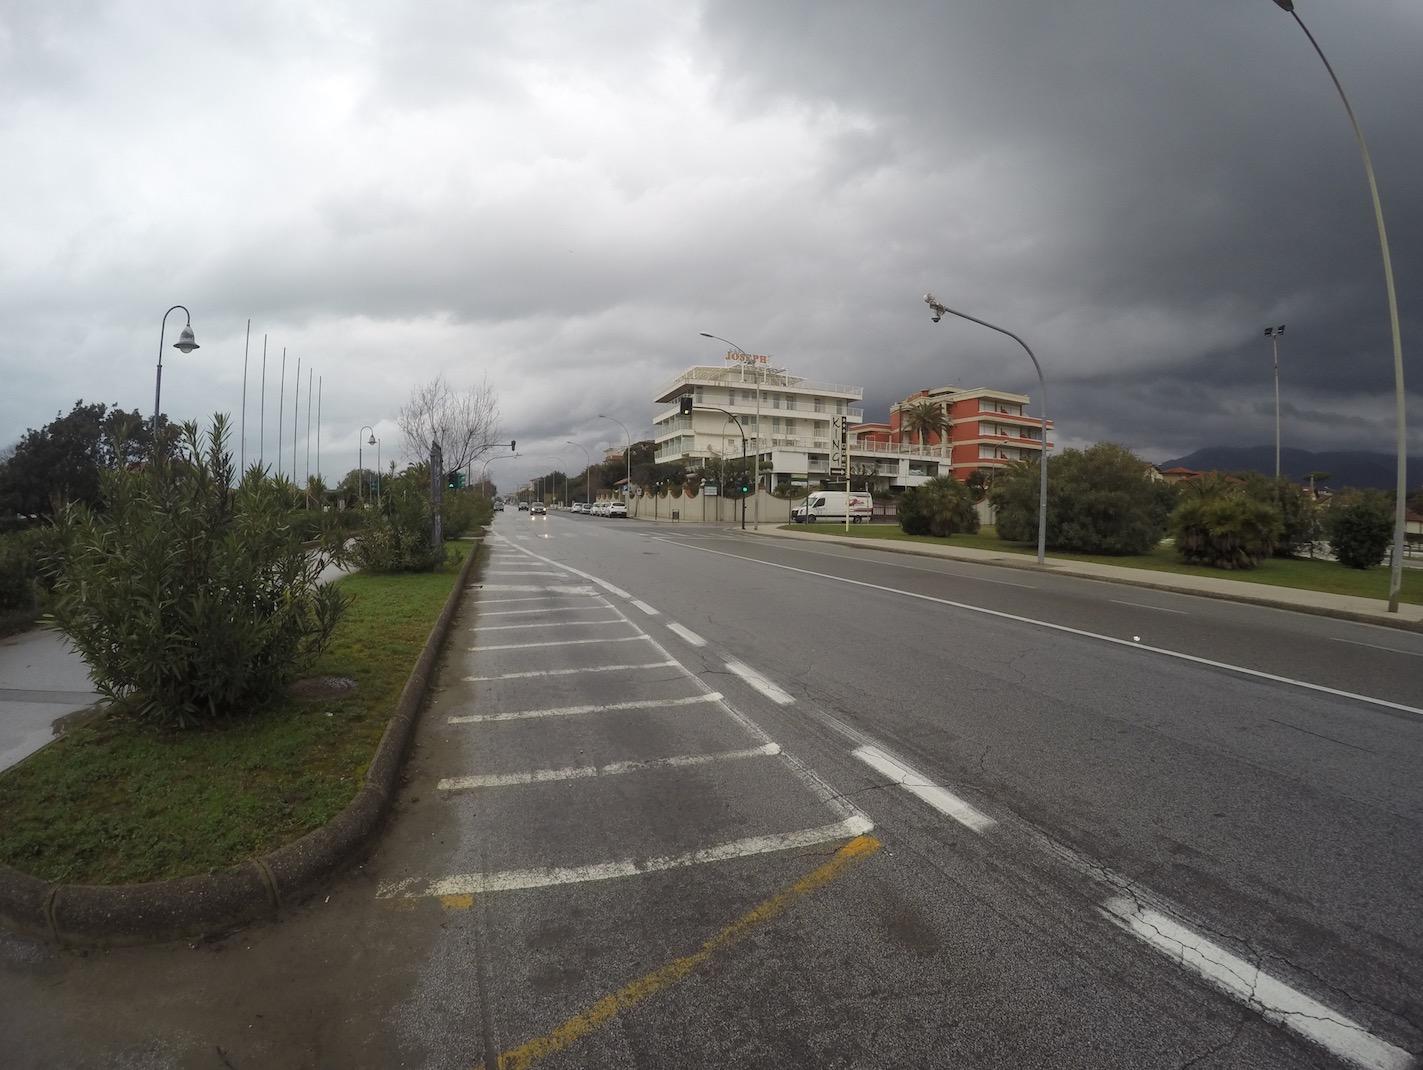 Pietrasanta, parcheggio gratis per i primi 15 minuti